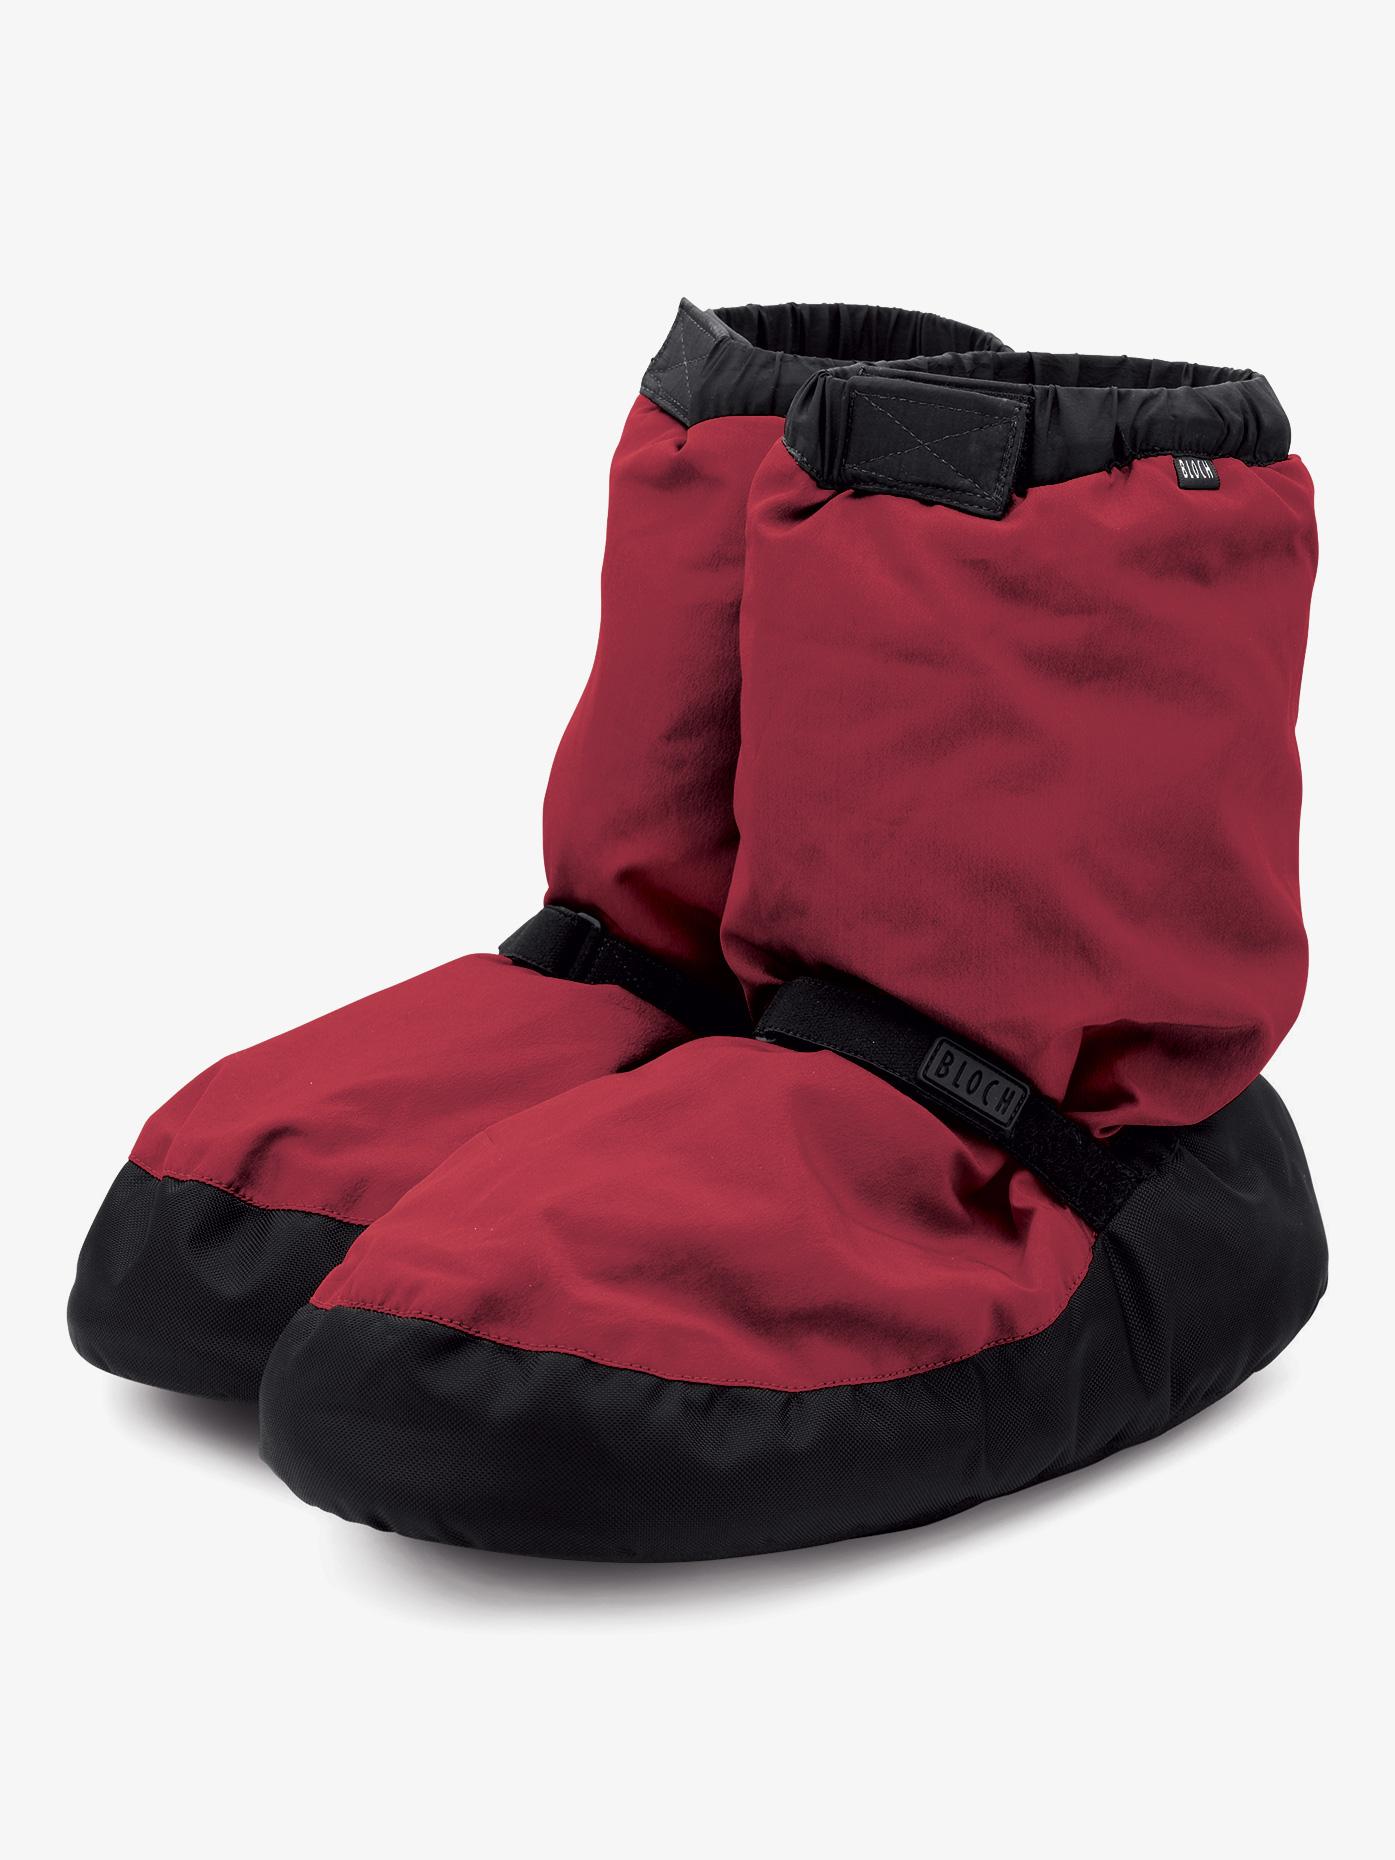 Warm Up Boots Accessories Bloch Im009 Discountdance Com